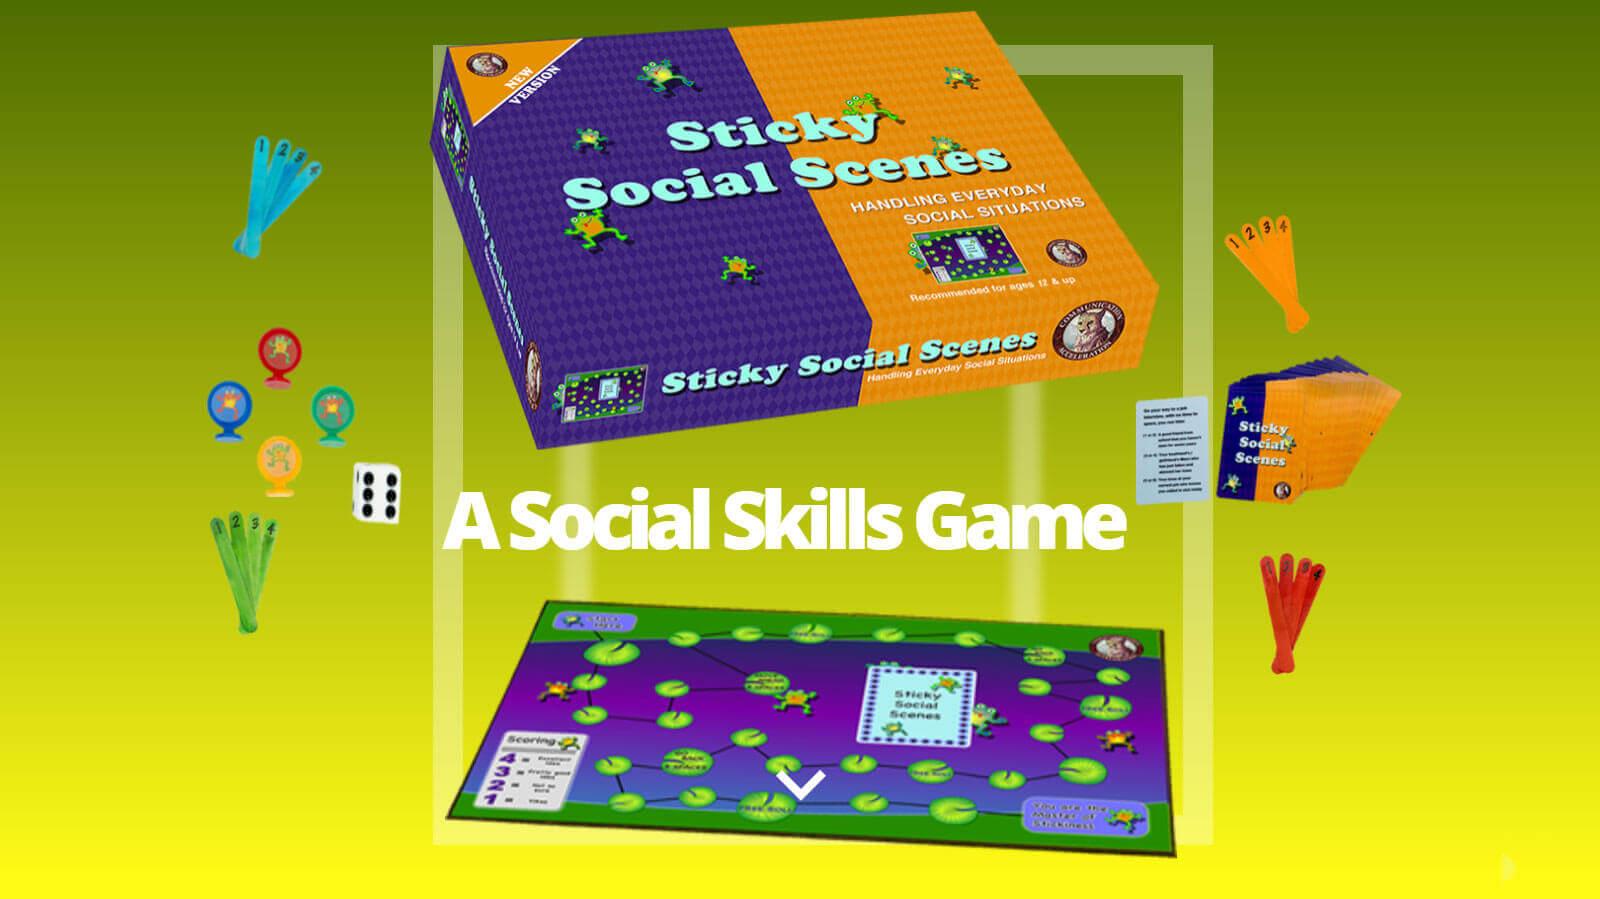 Get Social Skills Game: Sticky Social Scenes